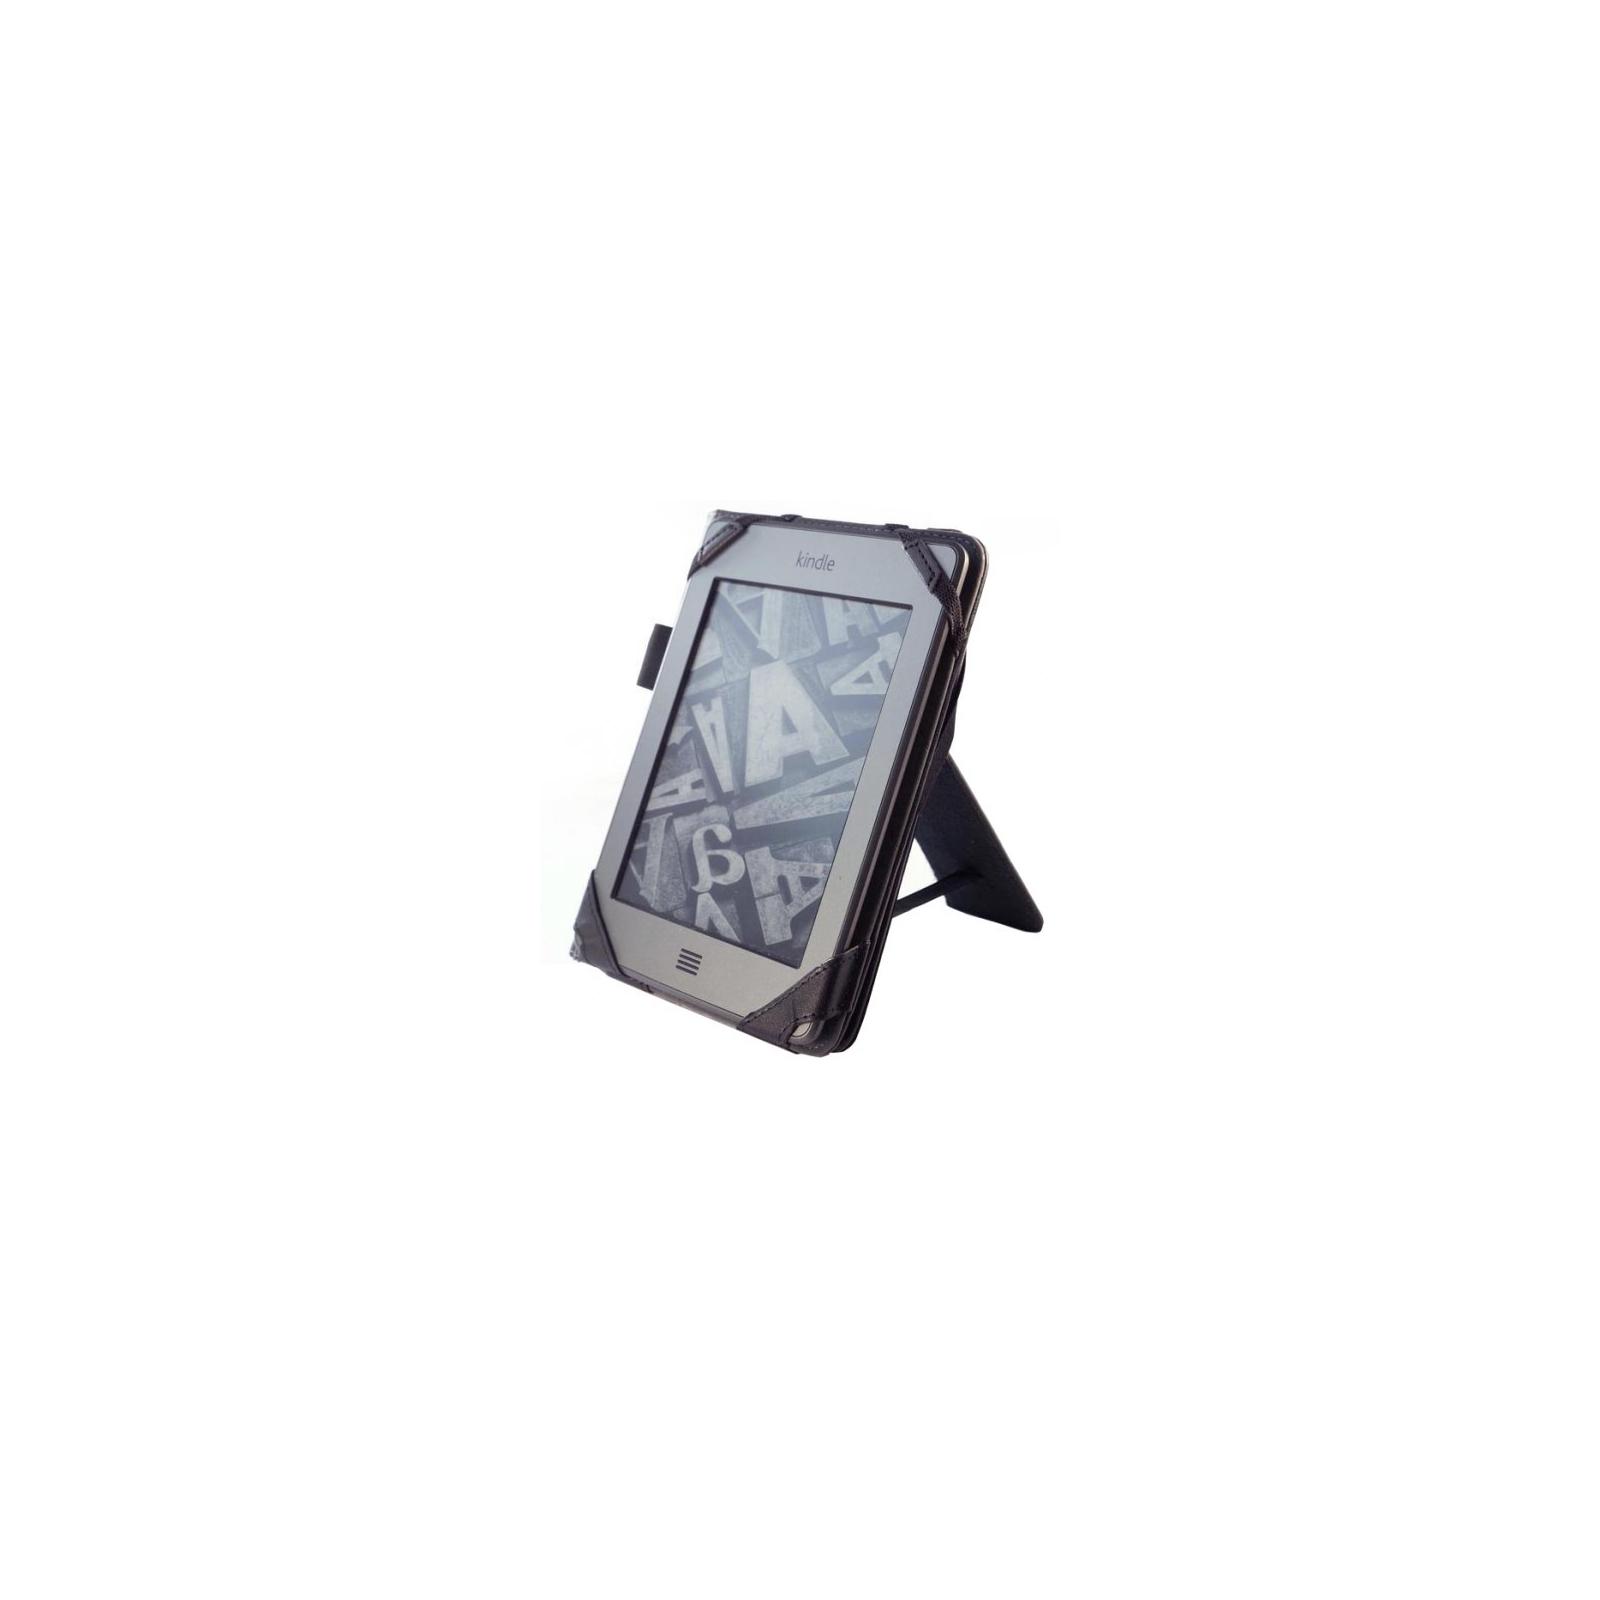 Чехол для электронной книги Tuff-Luv 6 Embrace Plus Leather Napa Black (A10_40) изображение 5